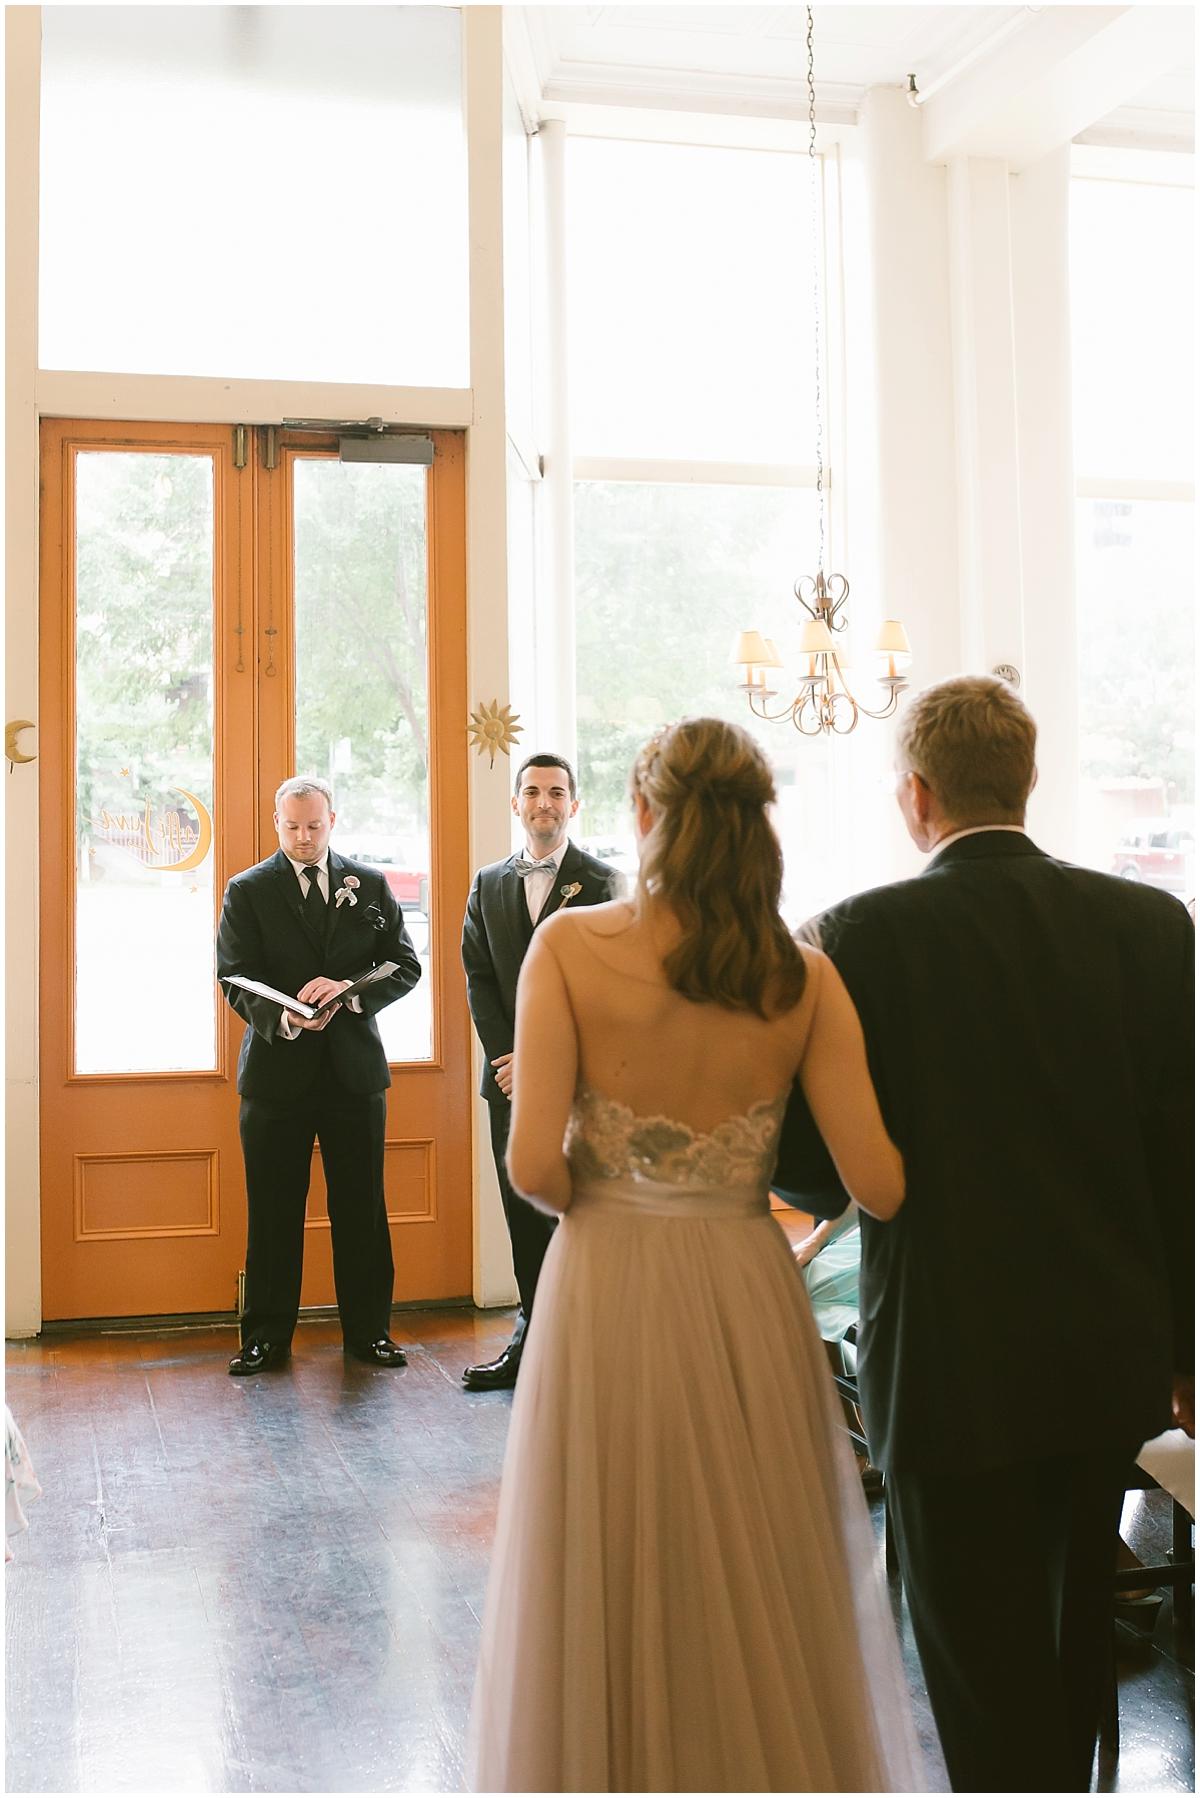 North_Carolina_wedding_photographer__0155.jpg